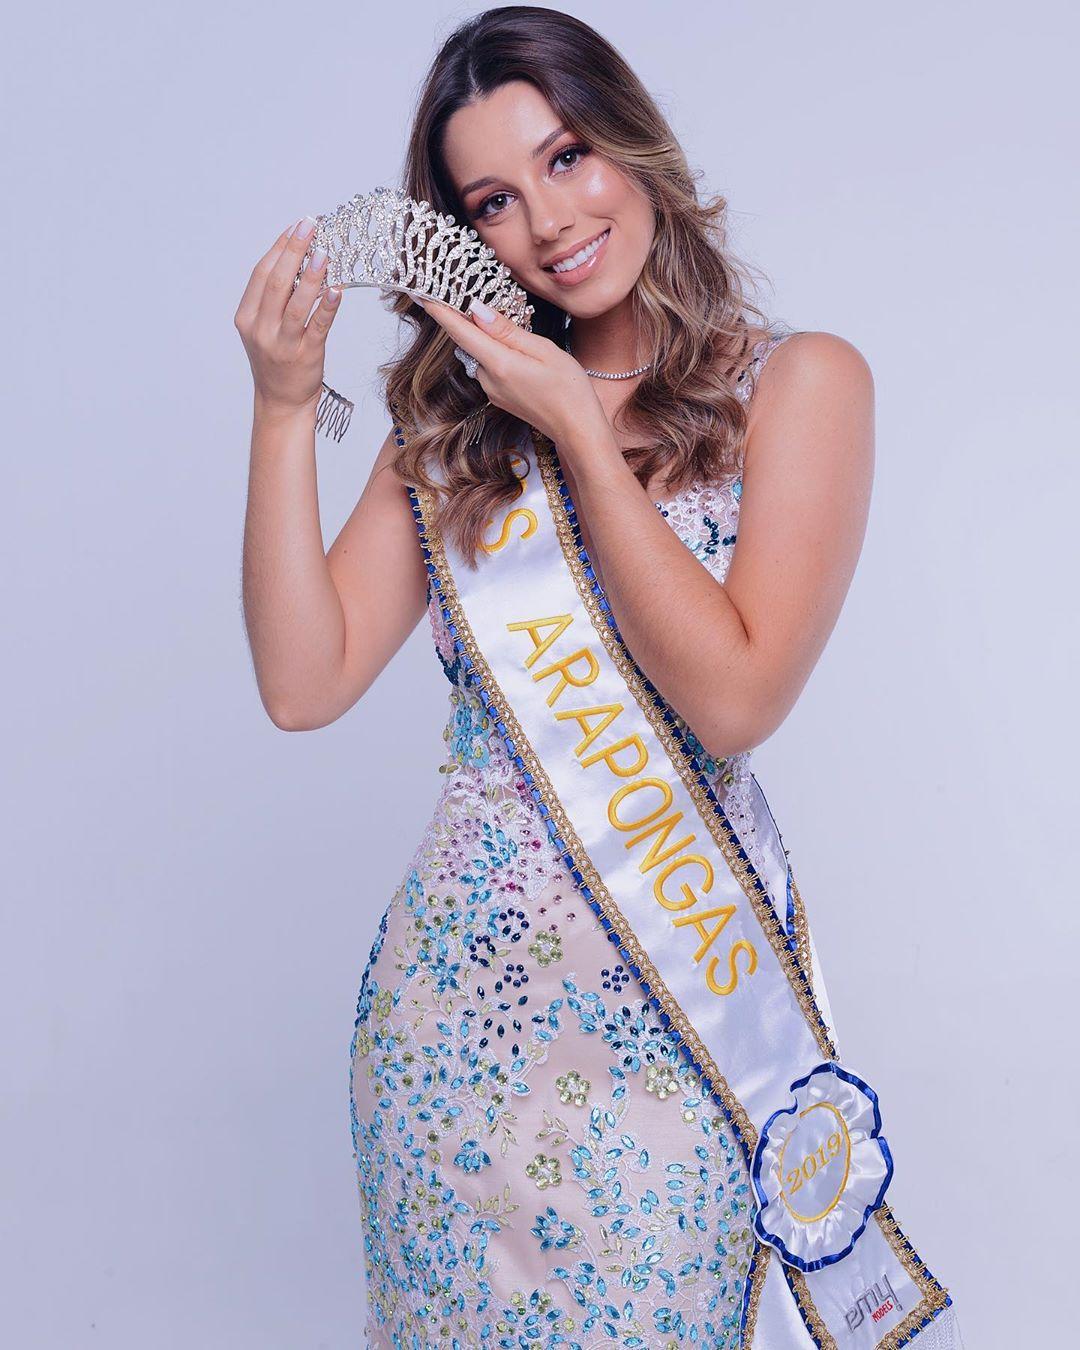 isabela stella, miss arapongas 2017/2019. (renunciou ao miss parana 2020). - Página 2 82005410